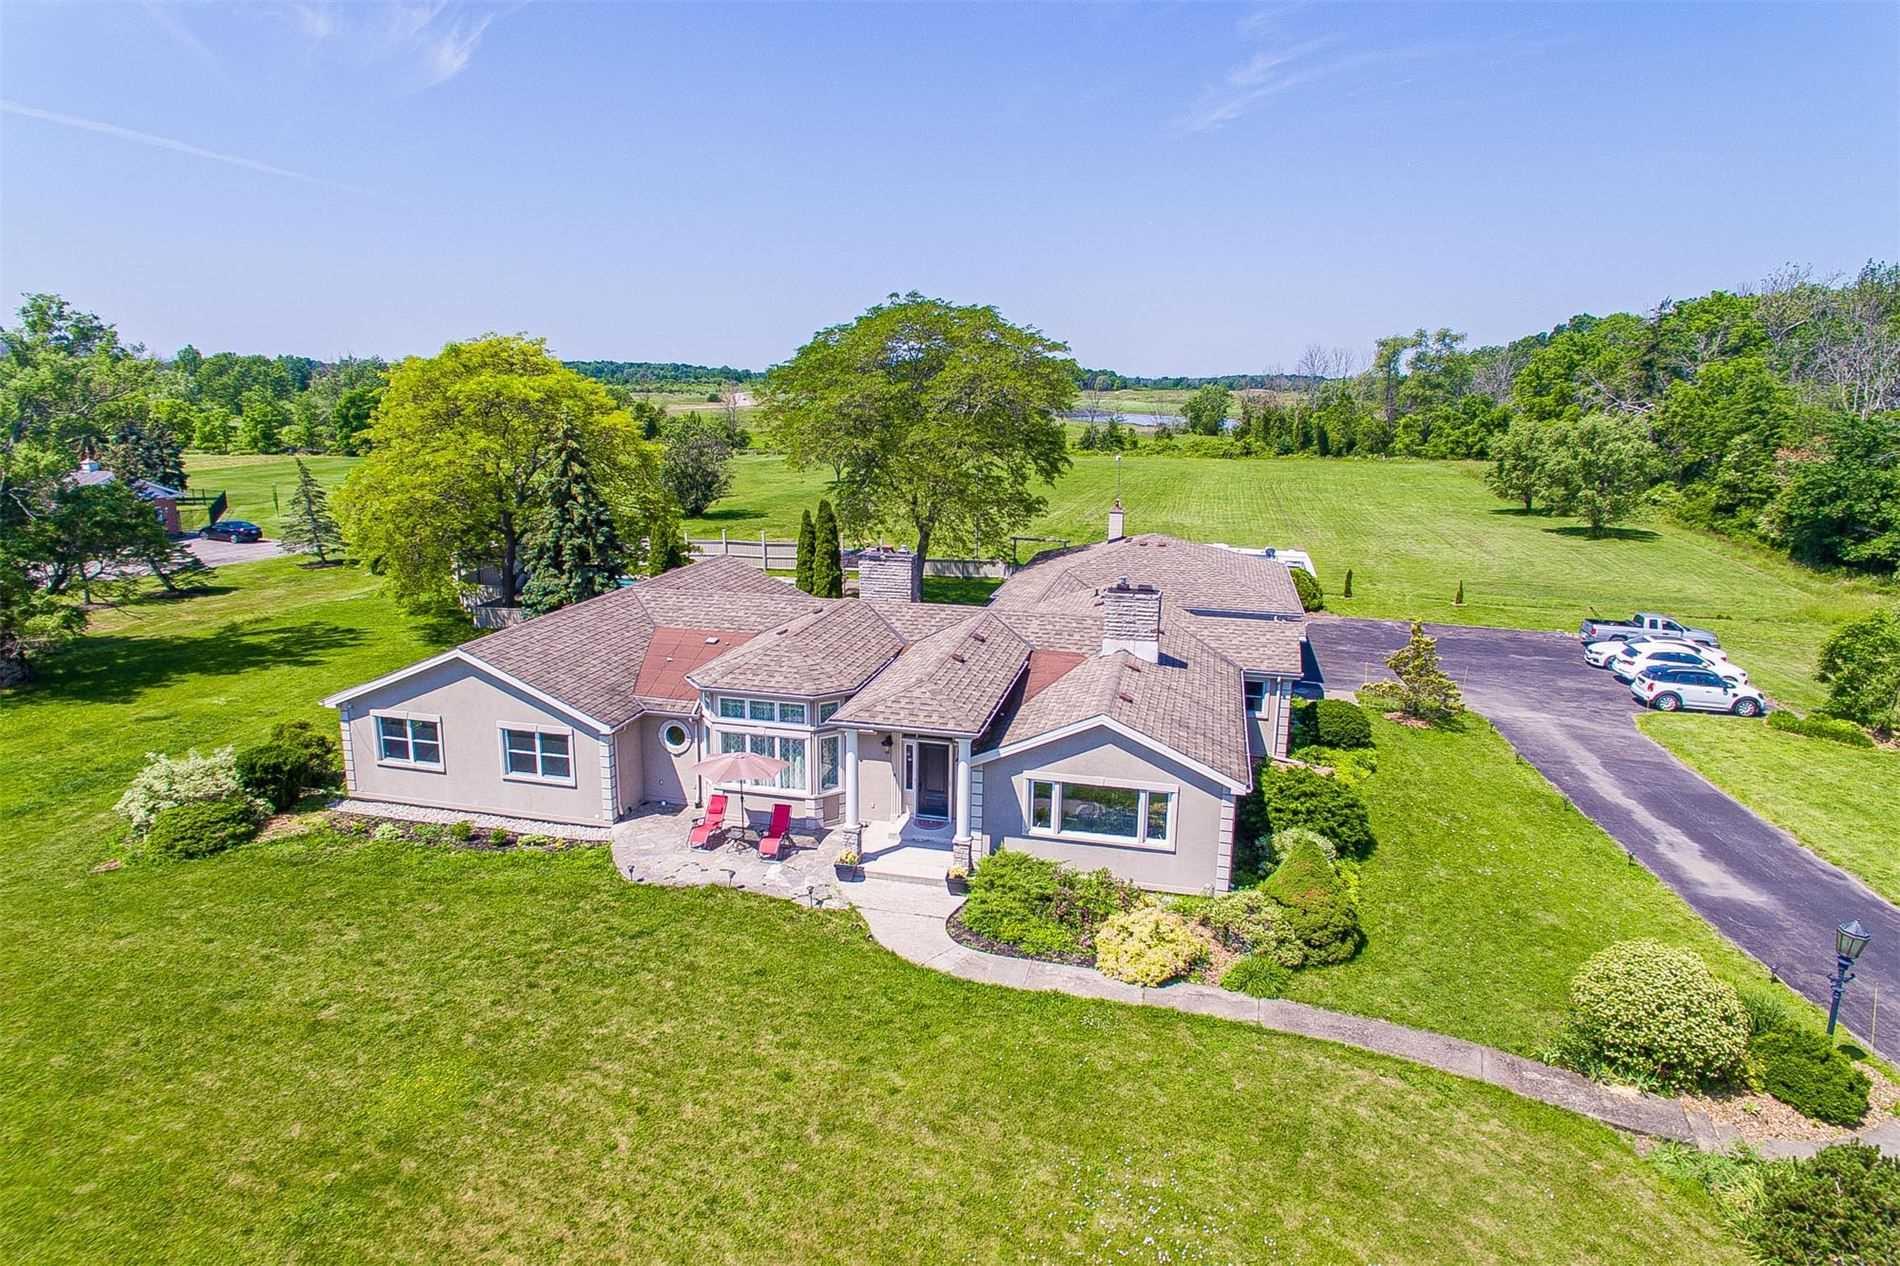 9443 Niagara Pkwy, Niagara Falls, Ontario L2E 6S6, 4 Bedrooms Bedrooms, ,3 BathroomsBathrooms,Detached,For Sale,Niagara,X5272978